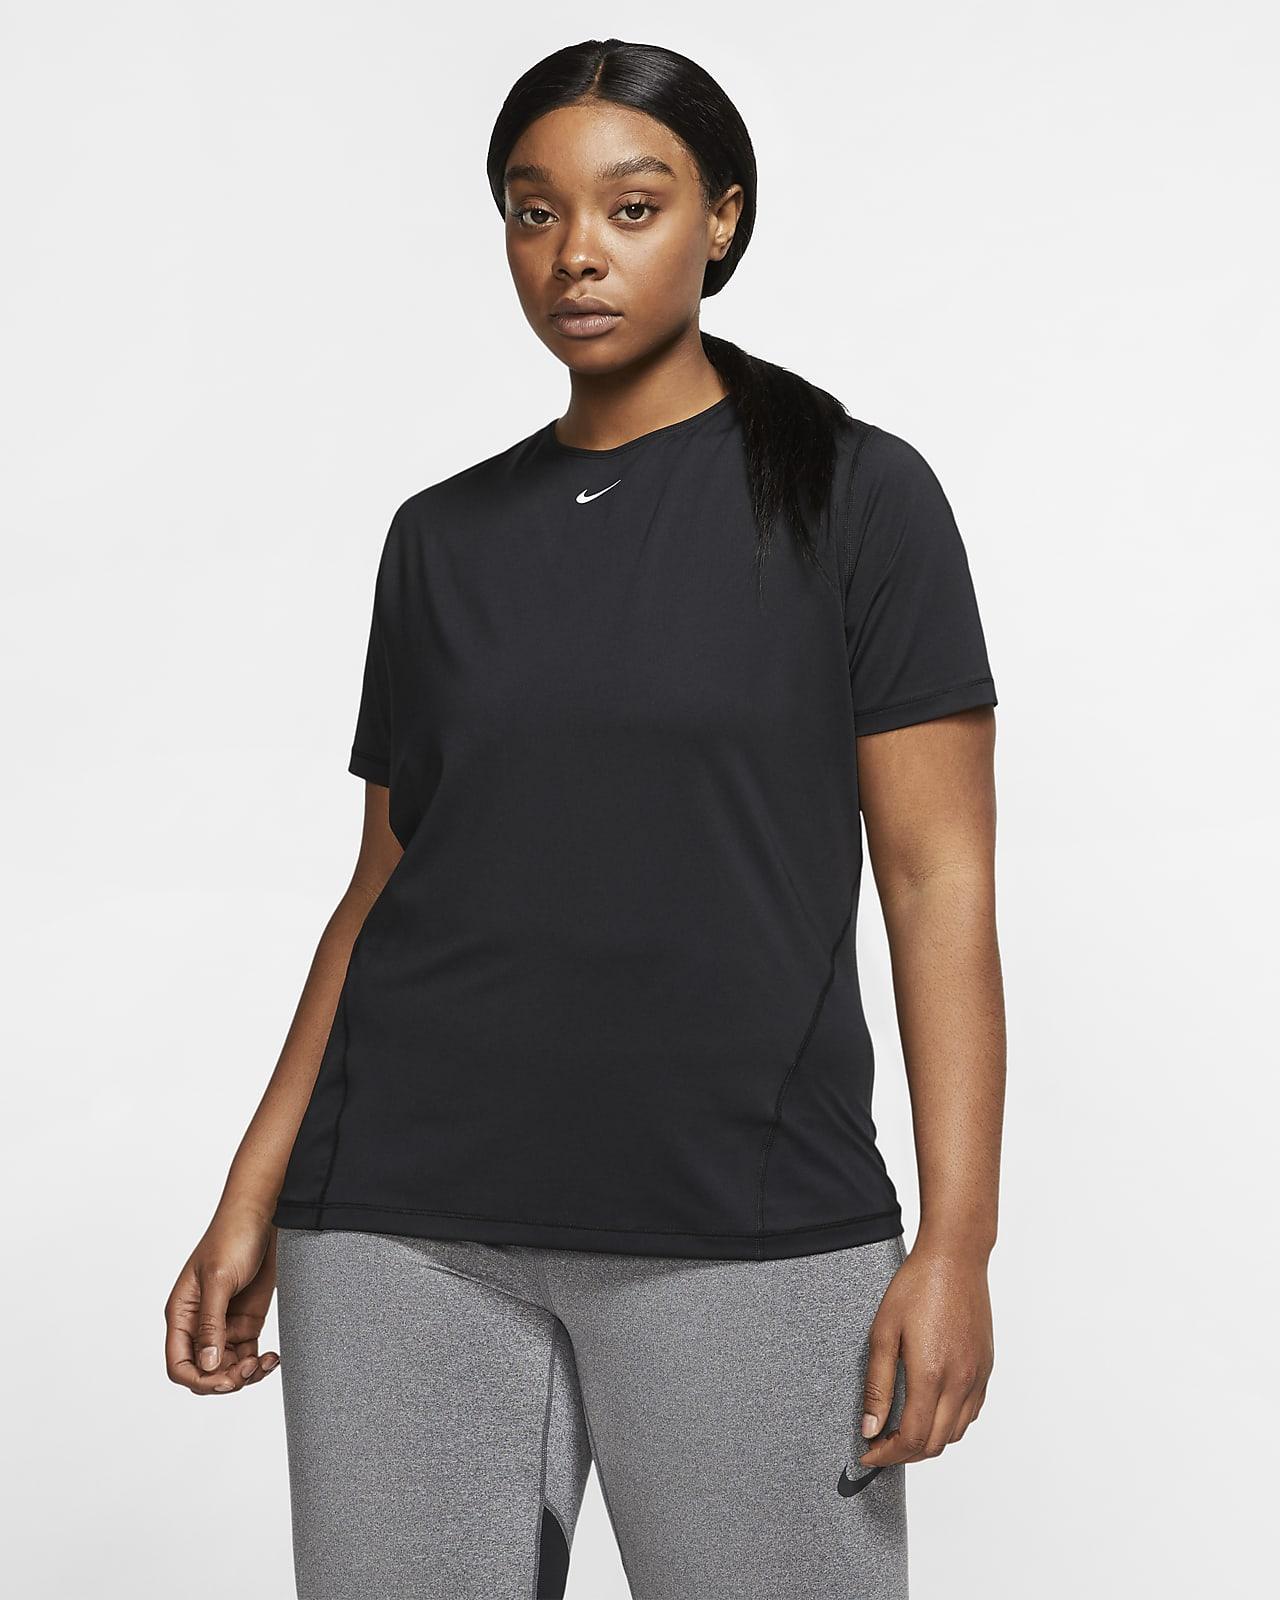 Nike Pro Women's Mesh Top (Plus Size)